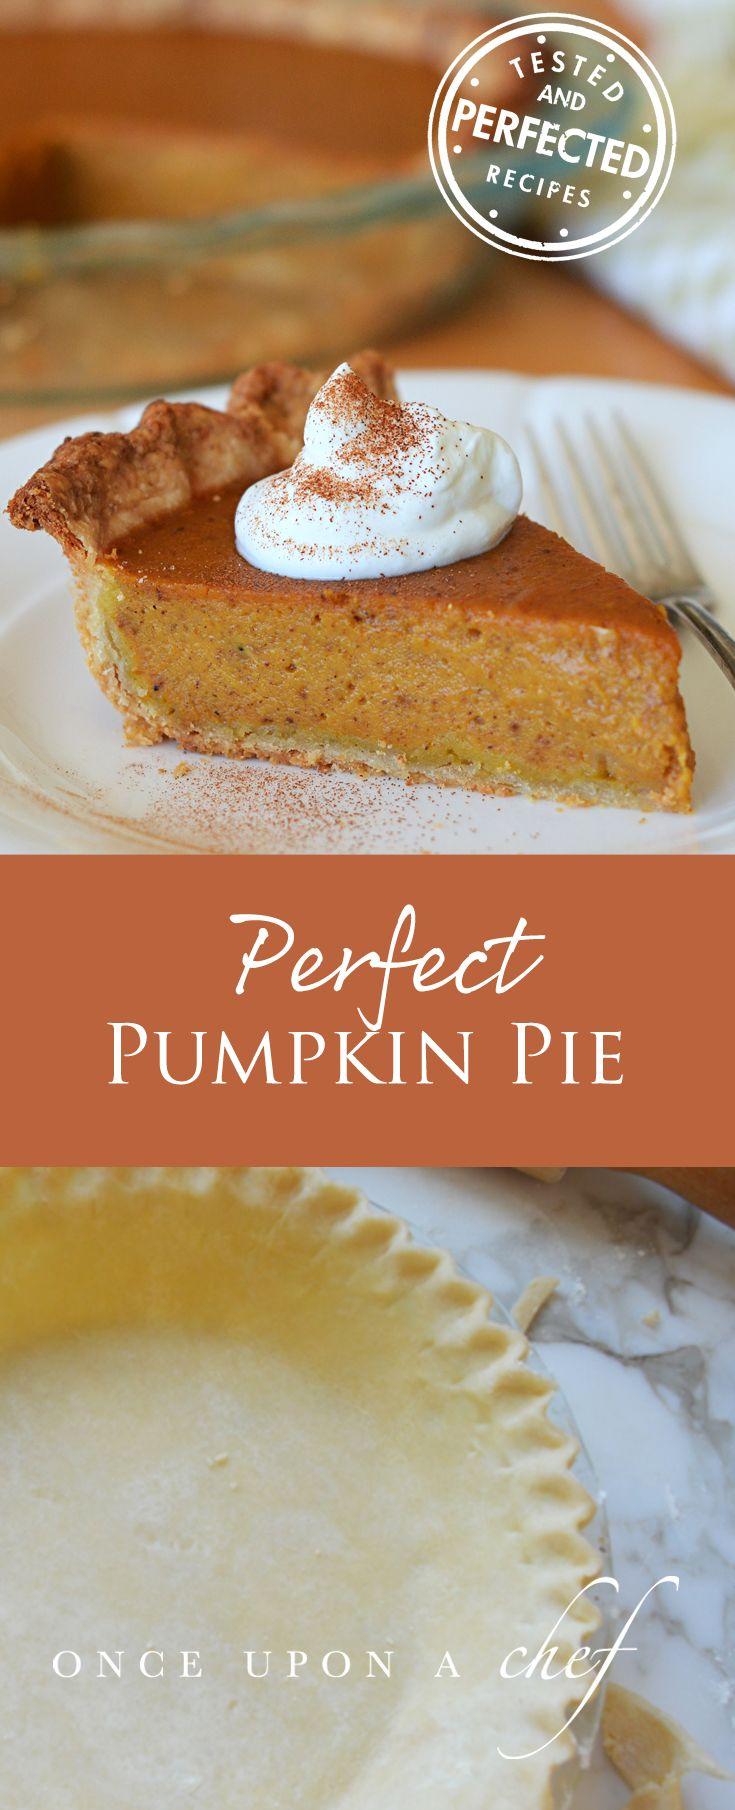 Perfect Pumpkin Pie - Once Upon a Chef #pumpkinpierecipe